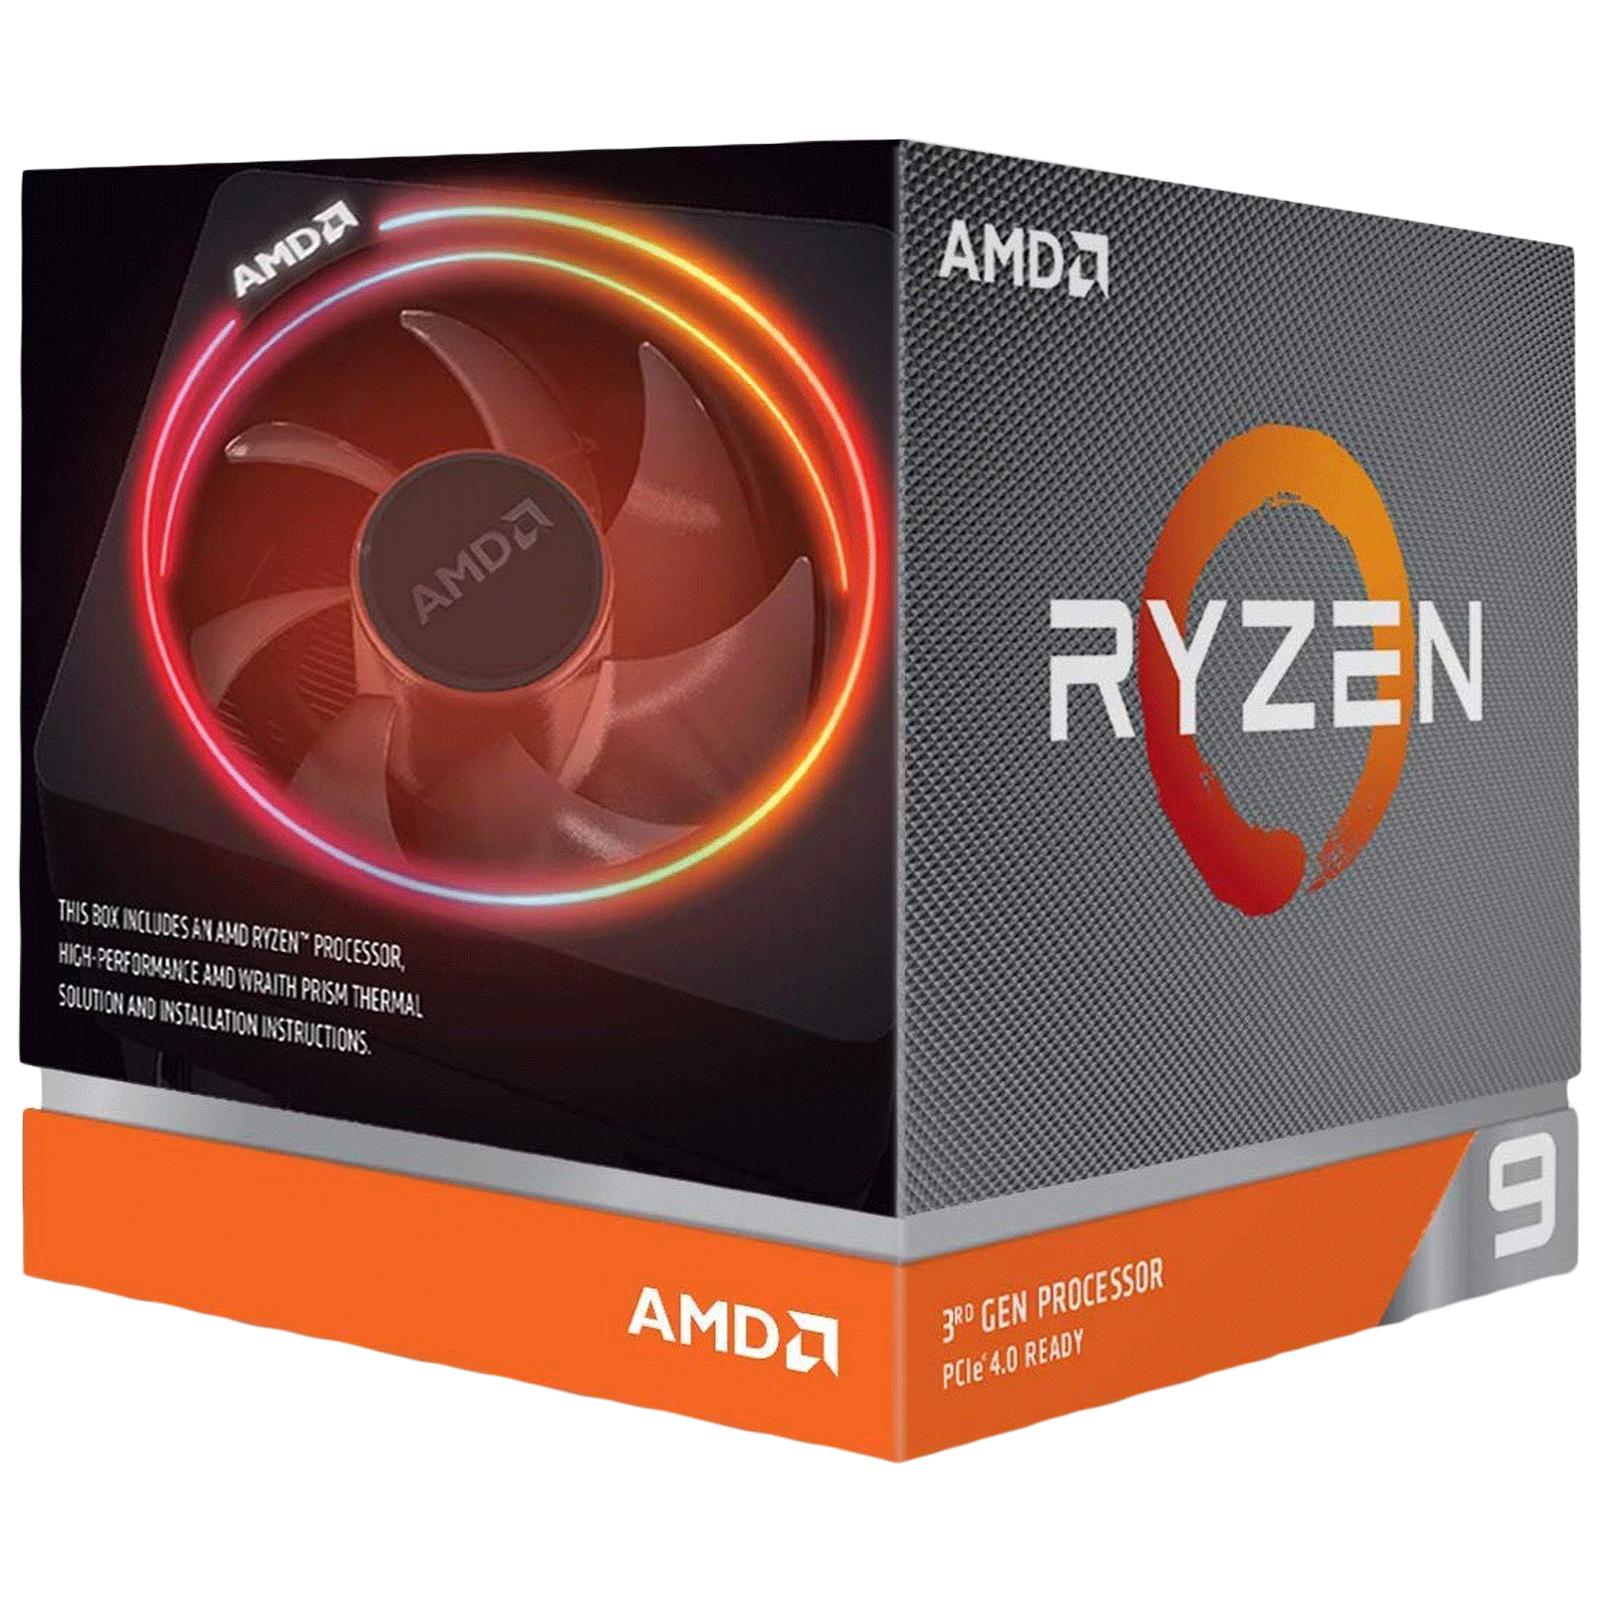 AMD Ryzen 9 Desktop Processor (12 Cores, 3.8 GHz, PCIe 4.0 x16, 3900X, Silver)_1